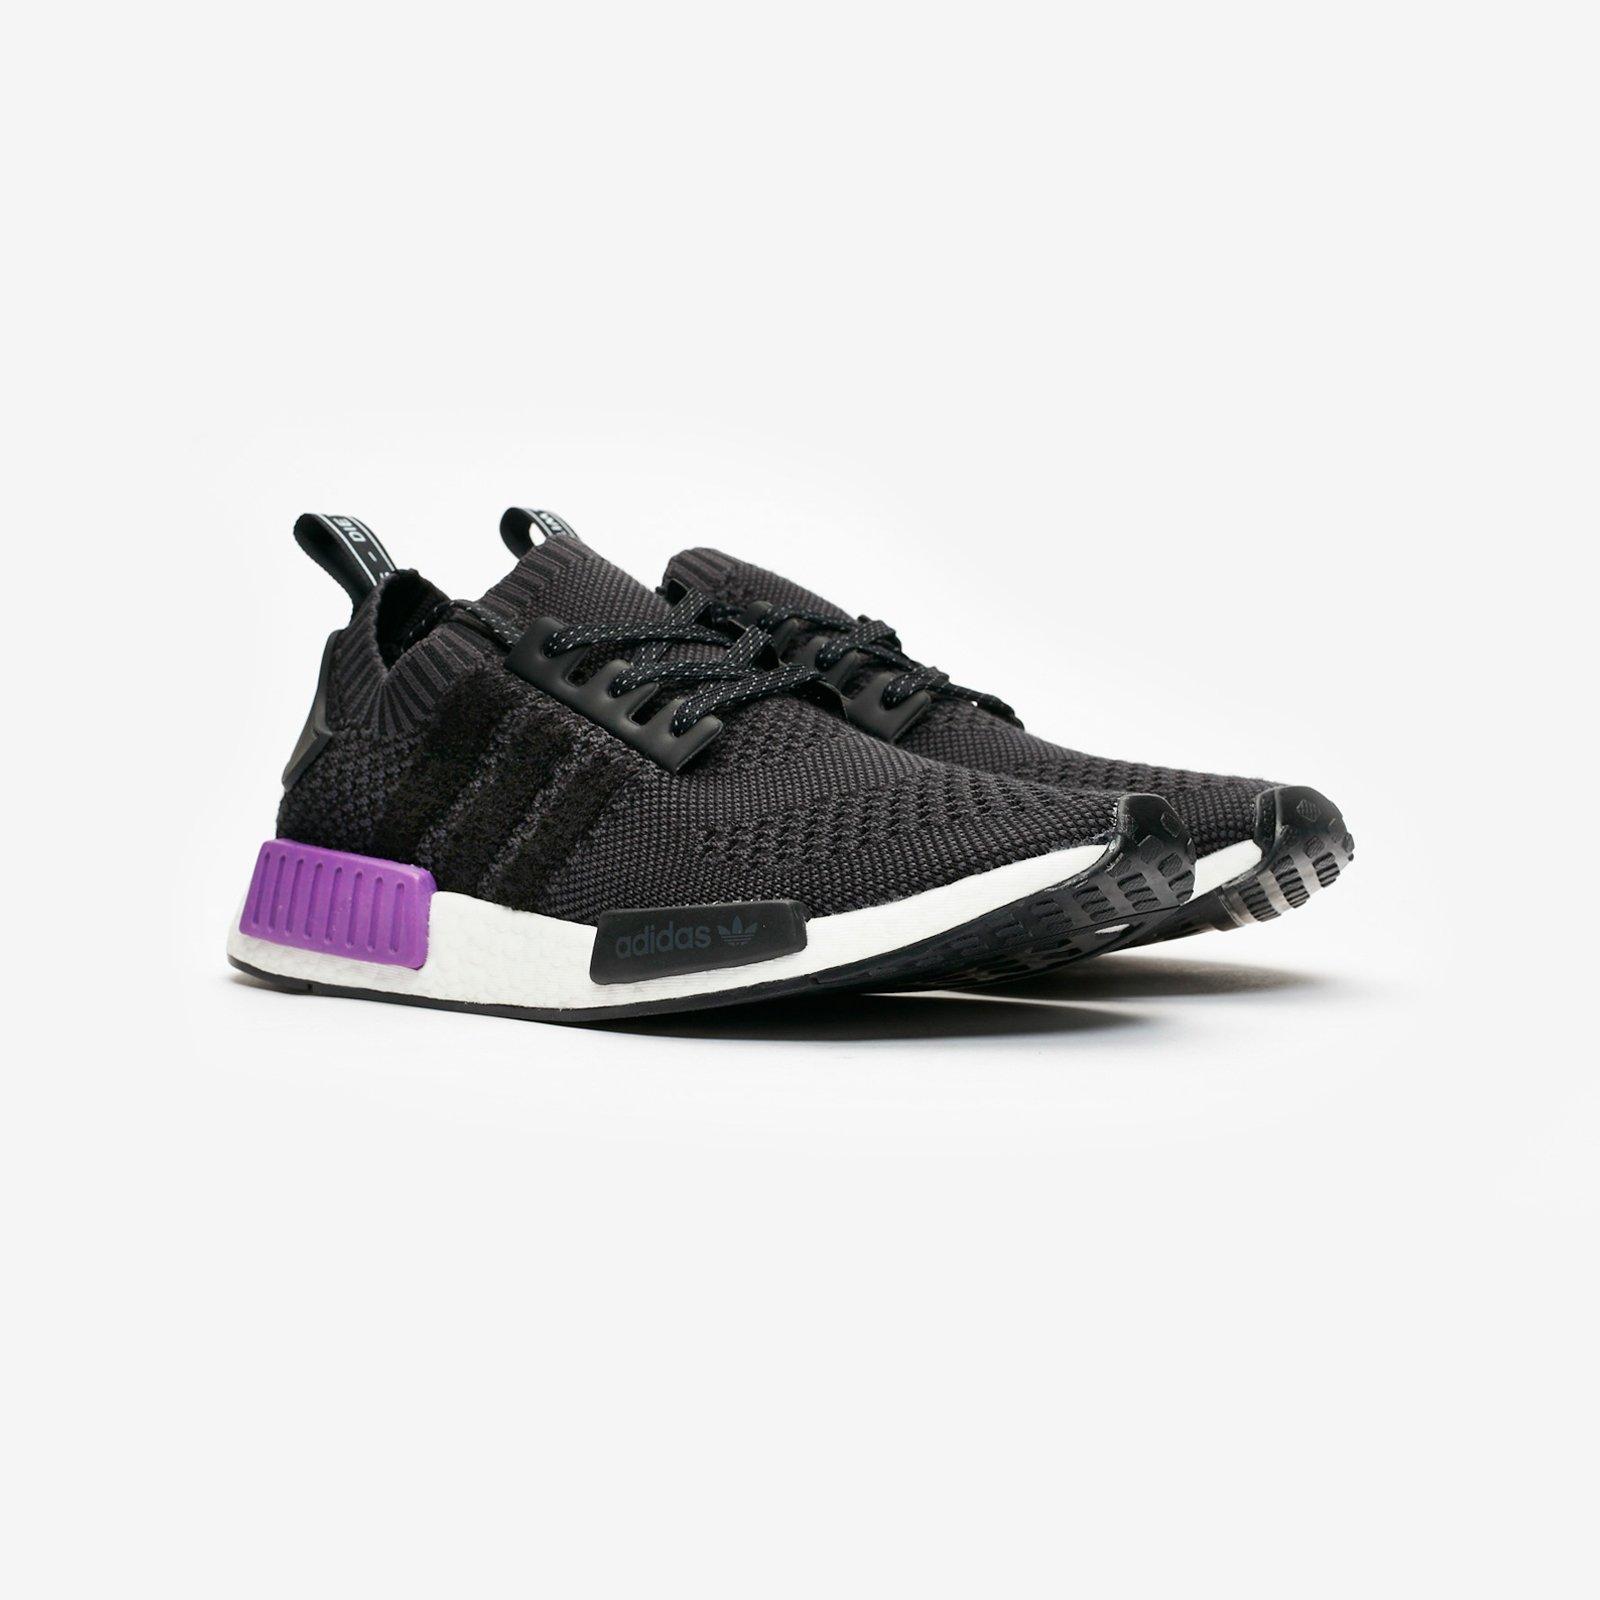 9778902df0a7f adidas NMD R1 PK - G54635 - Sneakersnstuff